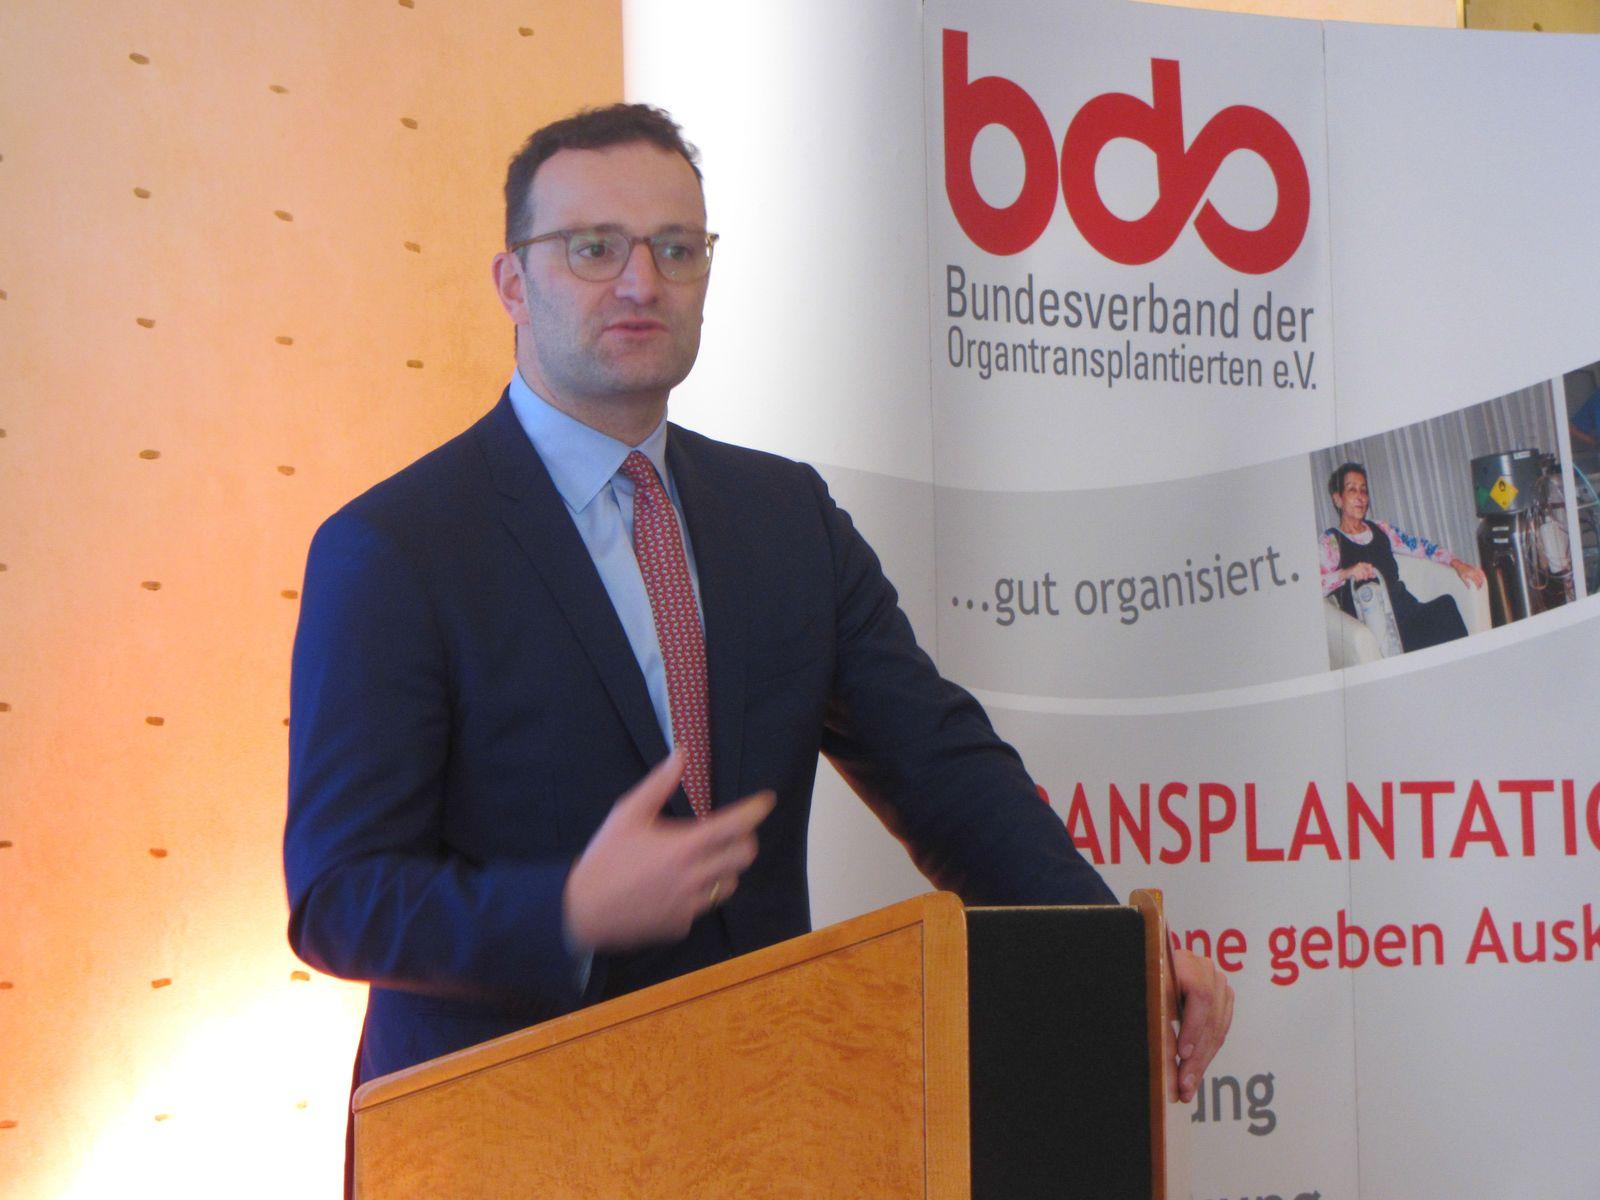 Minister Jens Spahn bei seiner Dankesrede